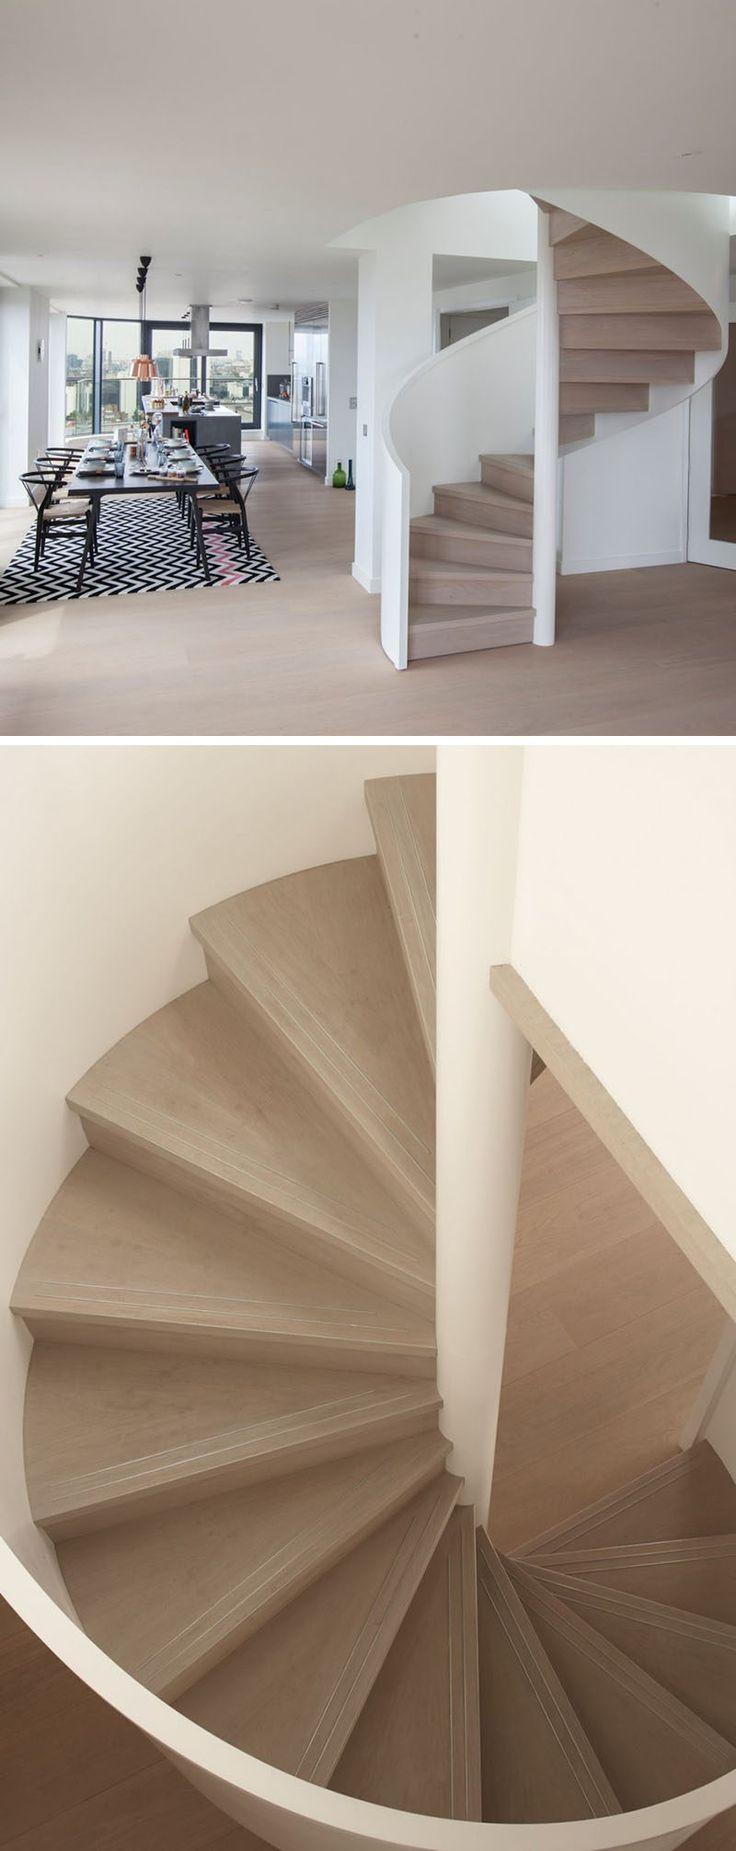 Best 25 Stair Box In Bedroom Ideas On Pinterest: Best 25+ Spiral Stair Ideas On Pinterest